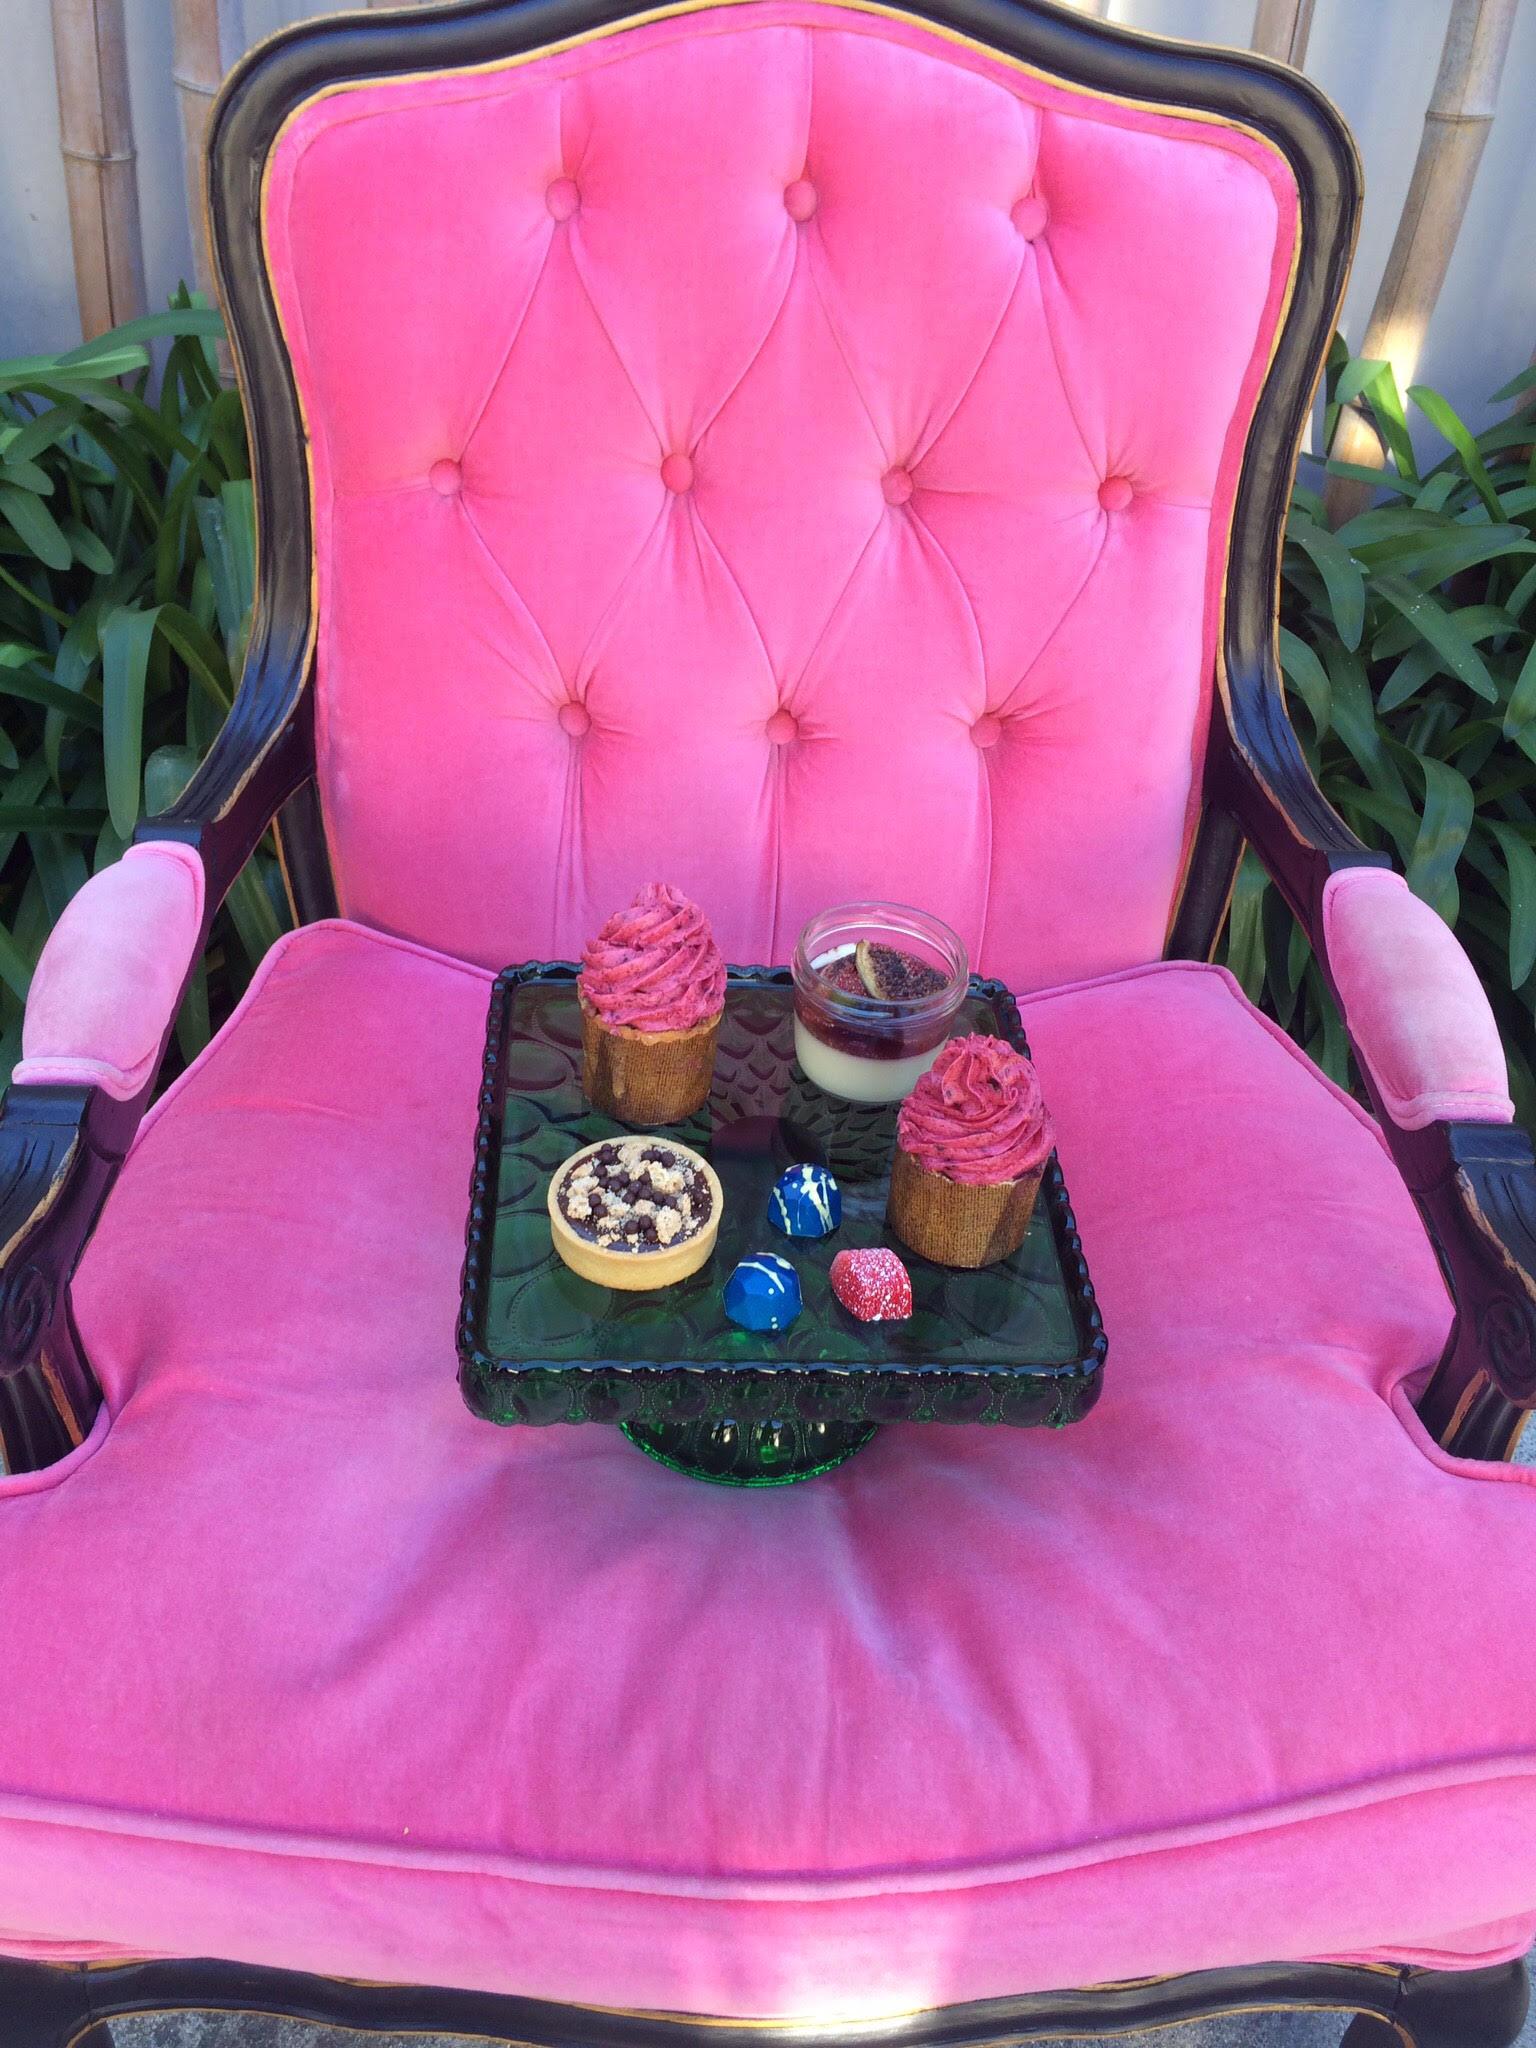 Assorted Vintage Coloured Glass Cake Stands I $40.00